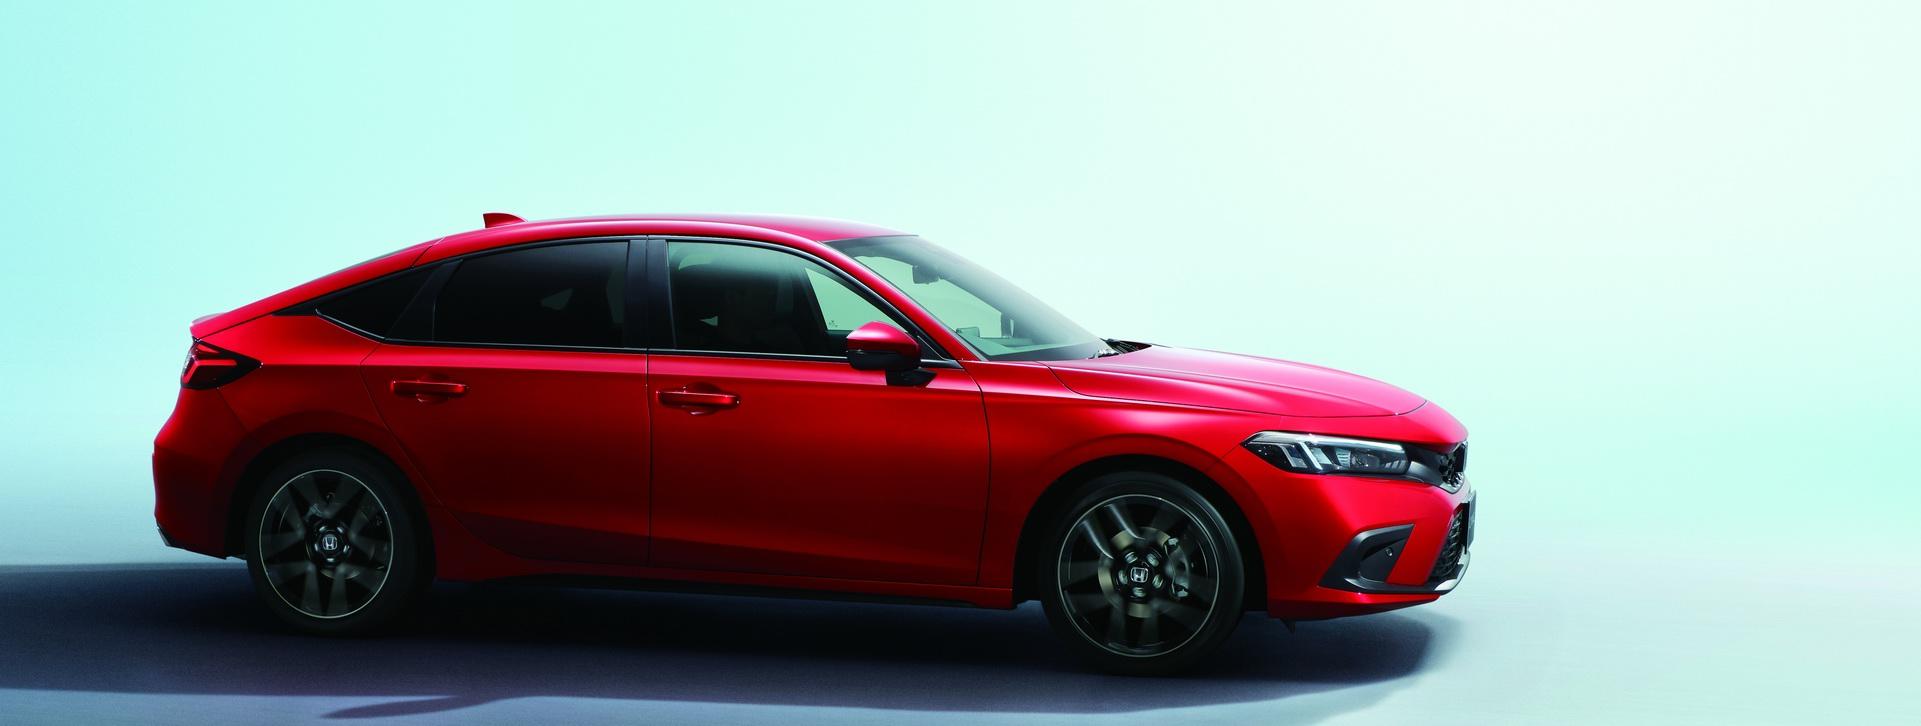 Honda-Civic-hatchback-19